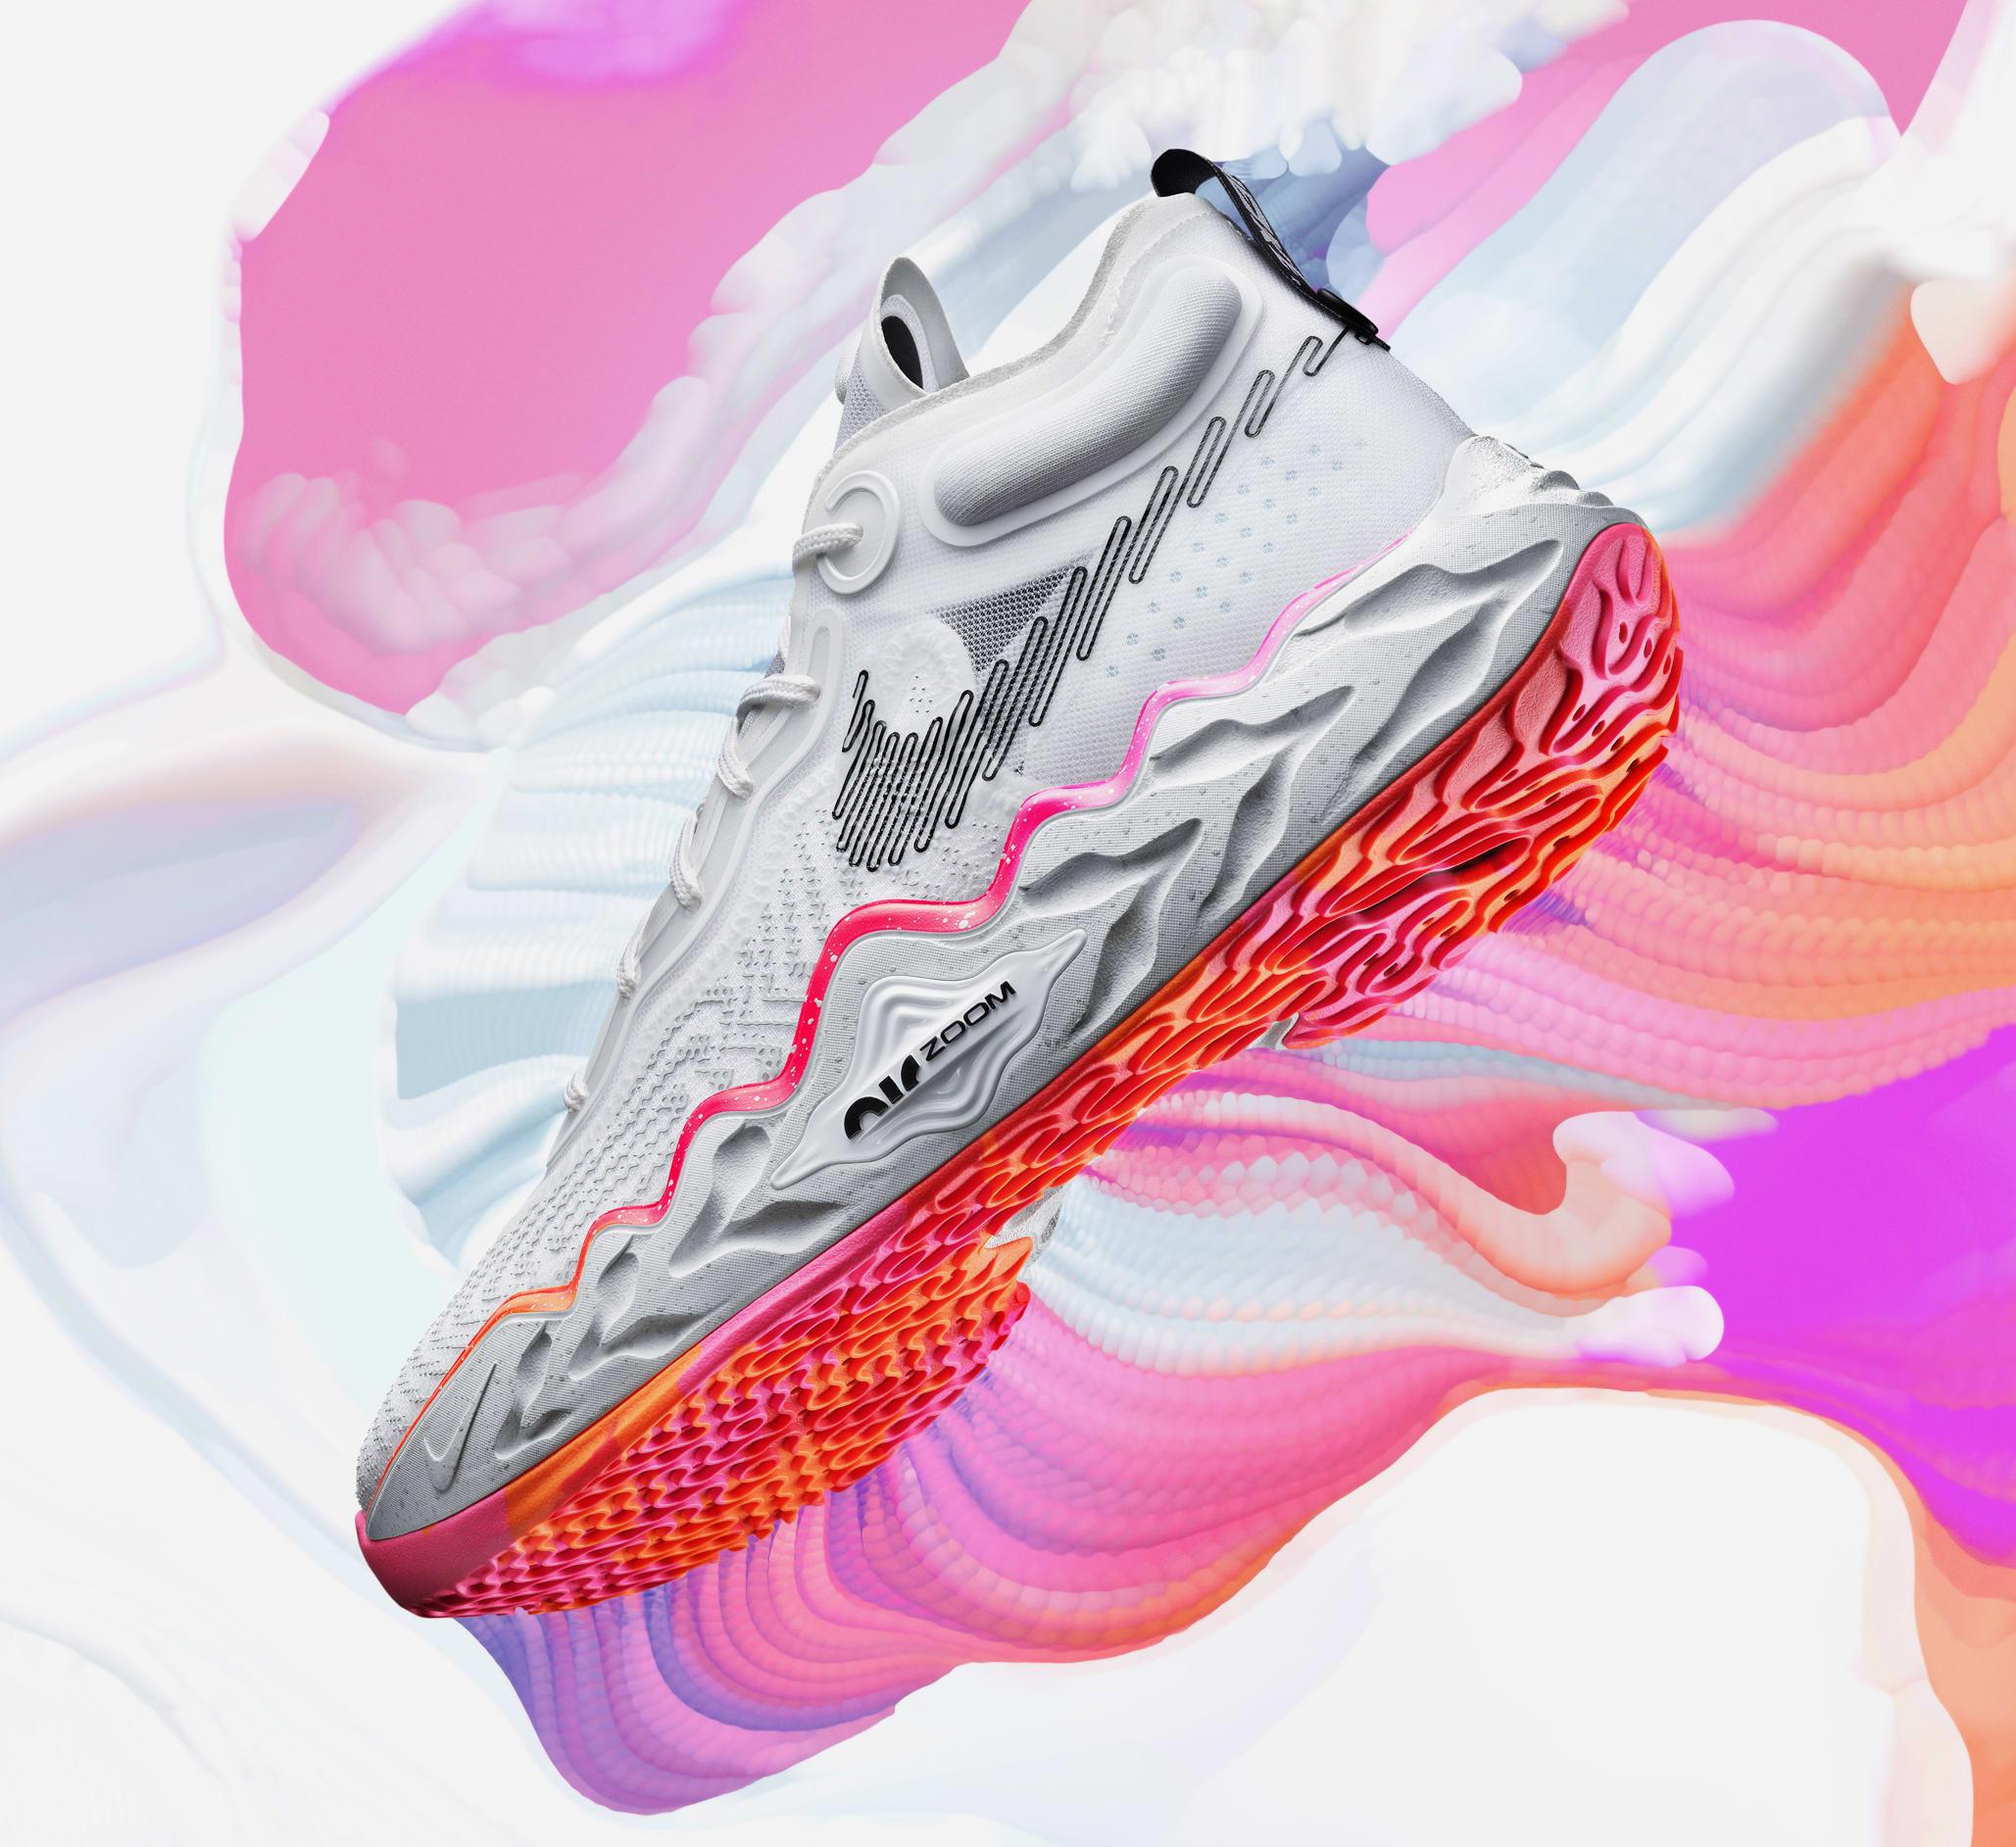 Nike Air Zoom GT Run 'Rawdacious'